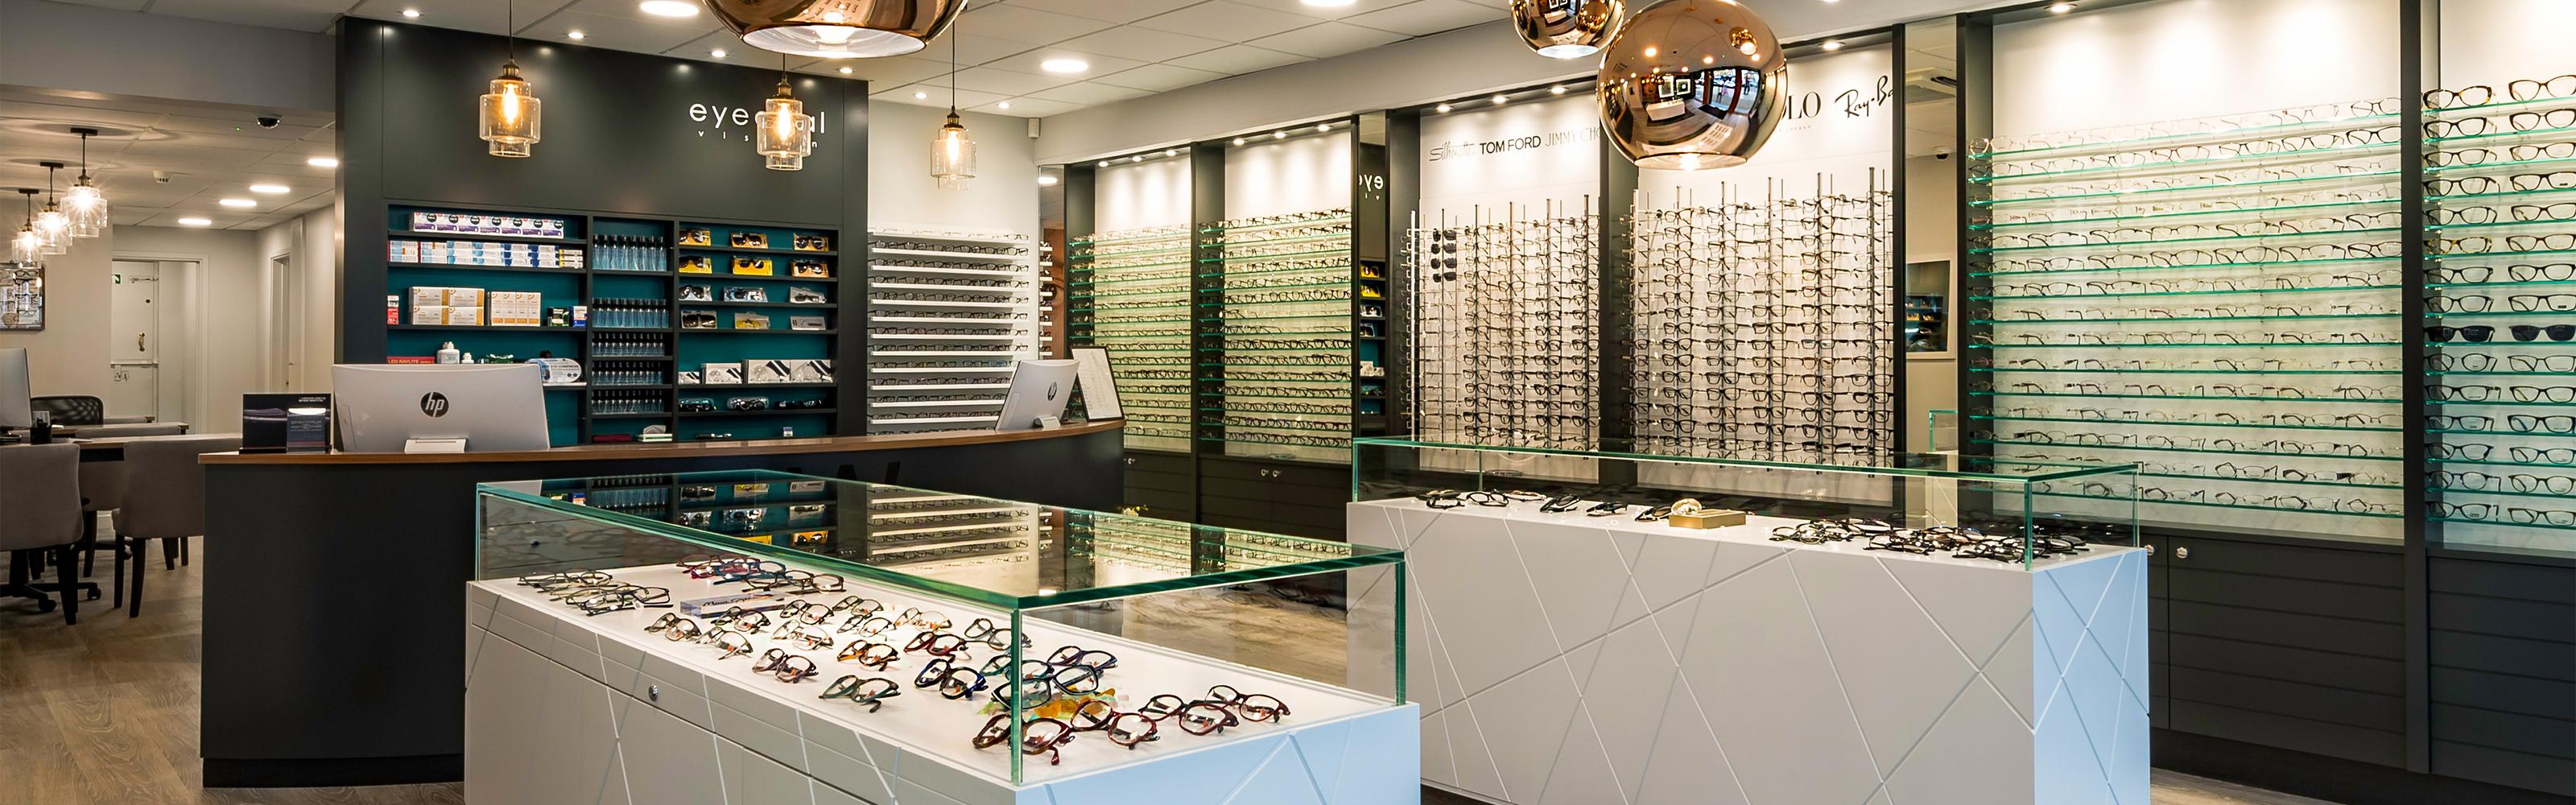 eyedeal vision opticians showroom glasses display